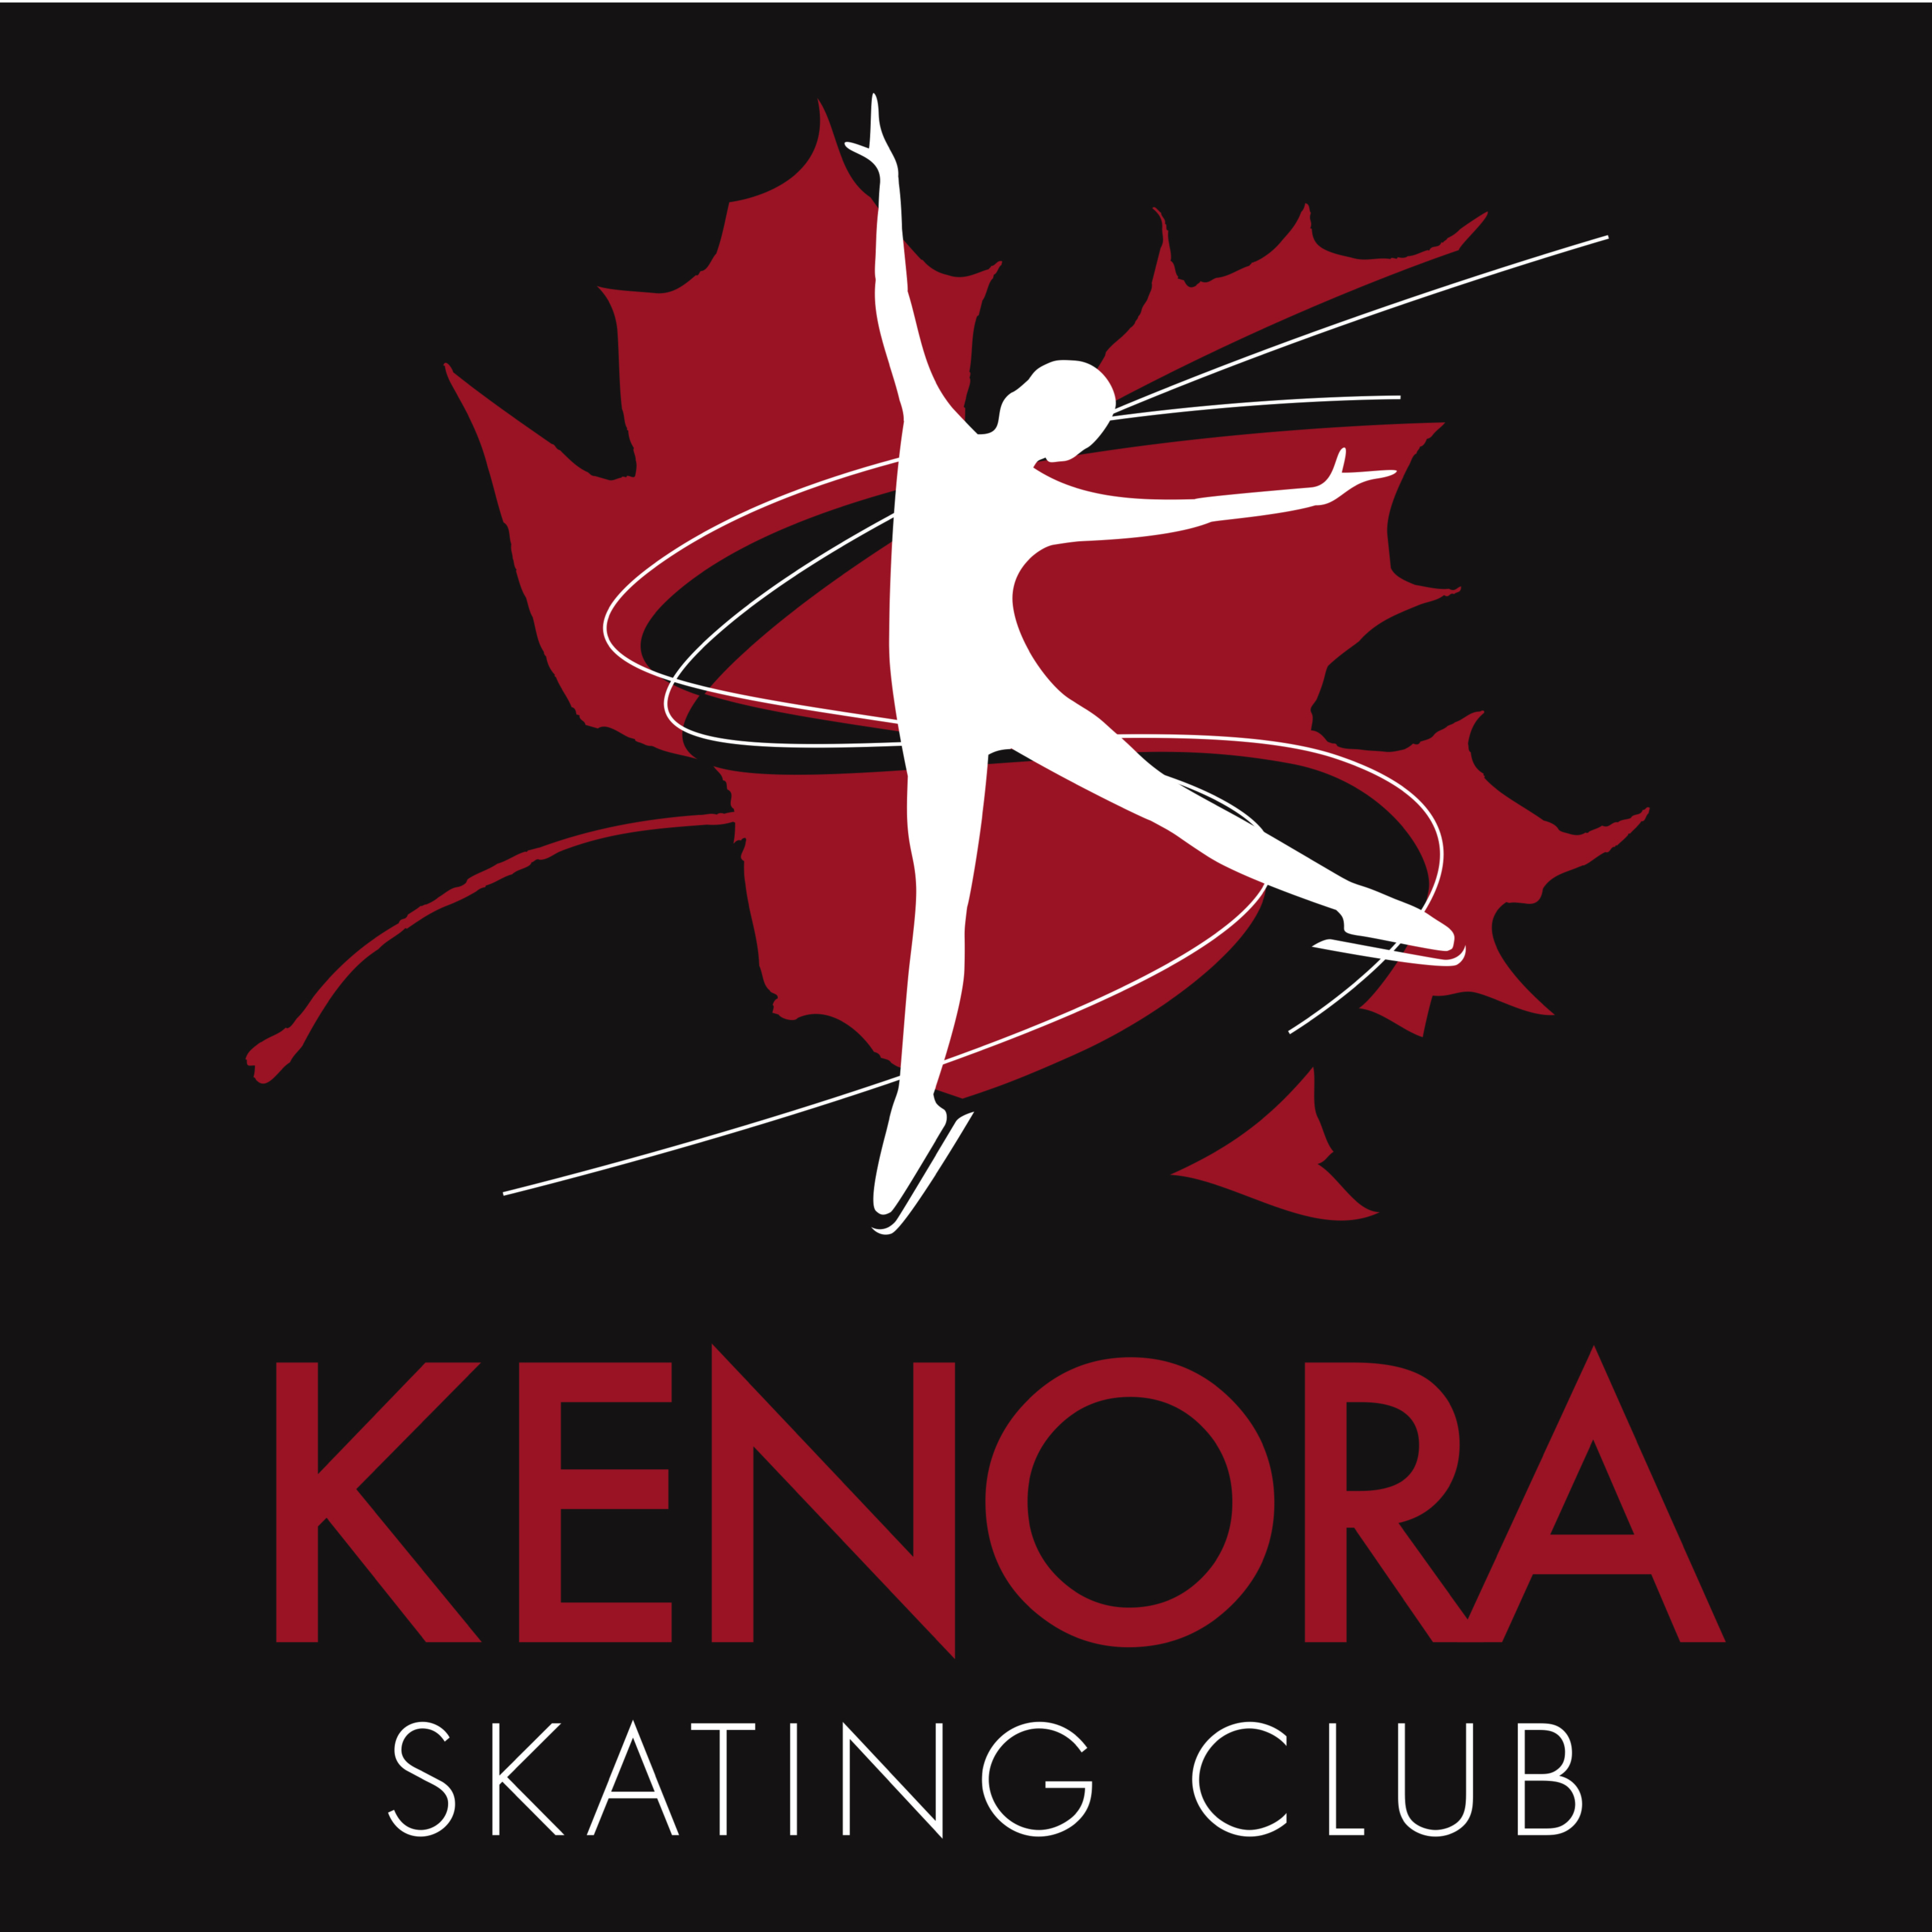 Kenora Skating Club